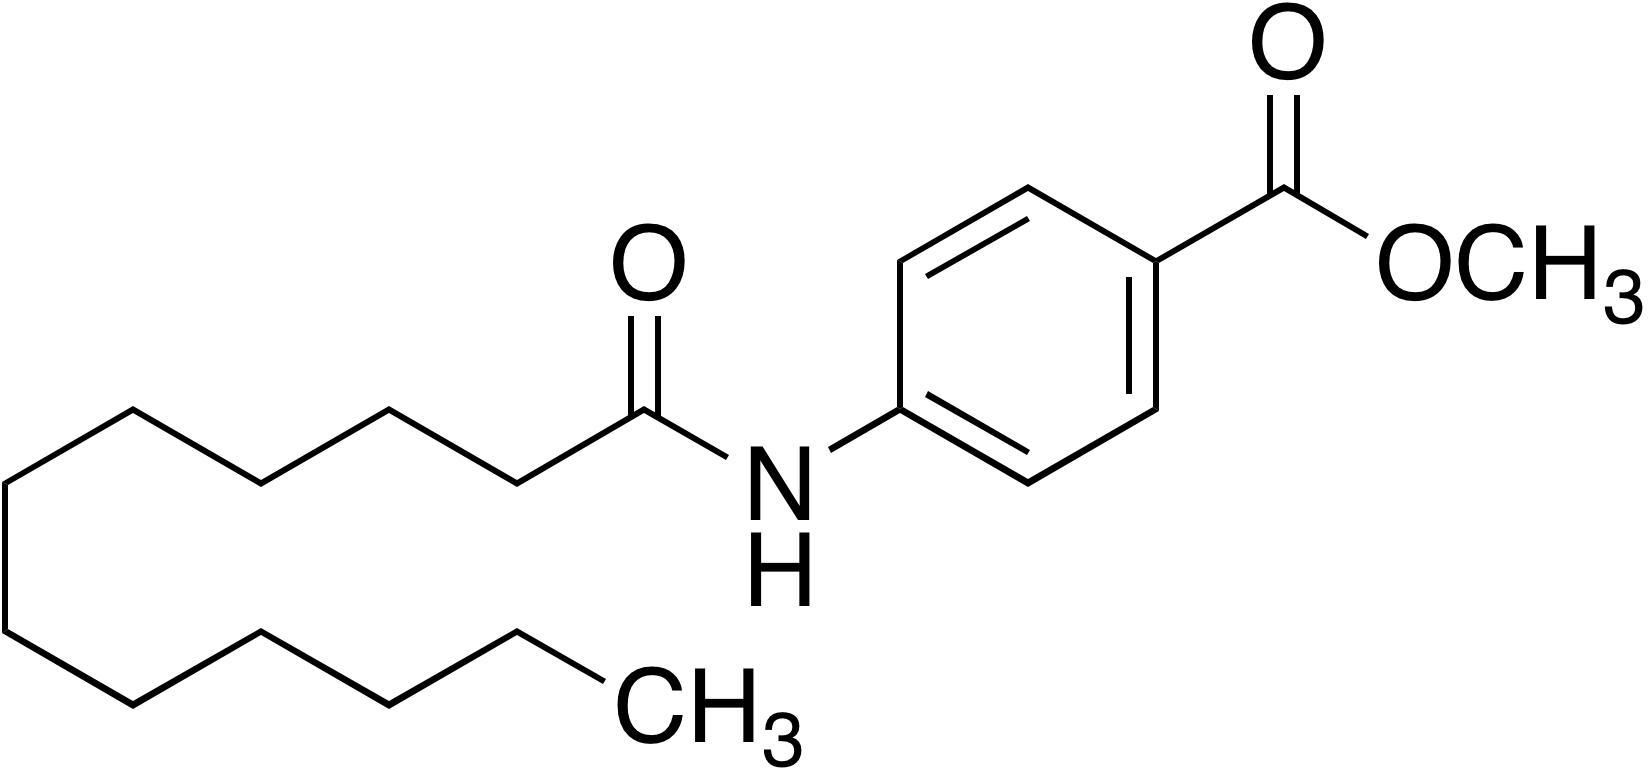 Methyl-4-dodecanamidobenzoate